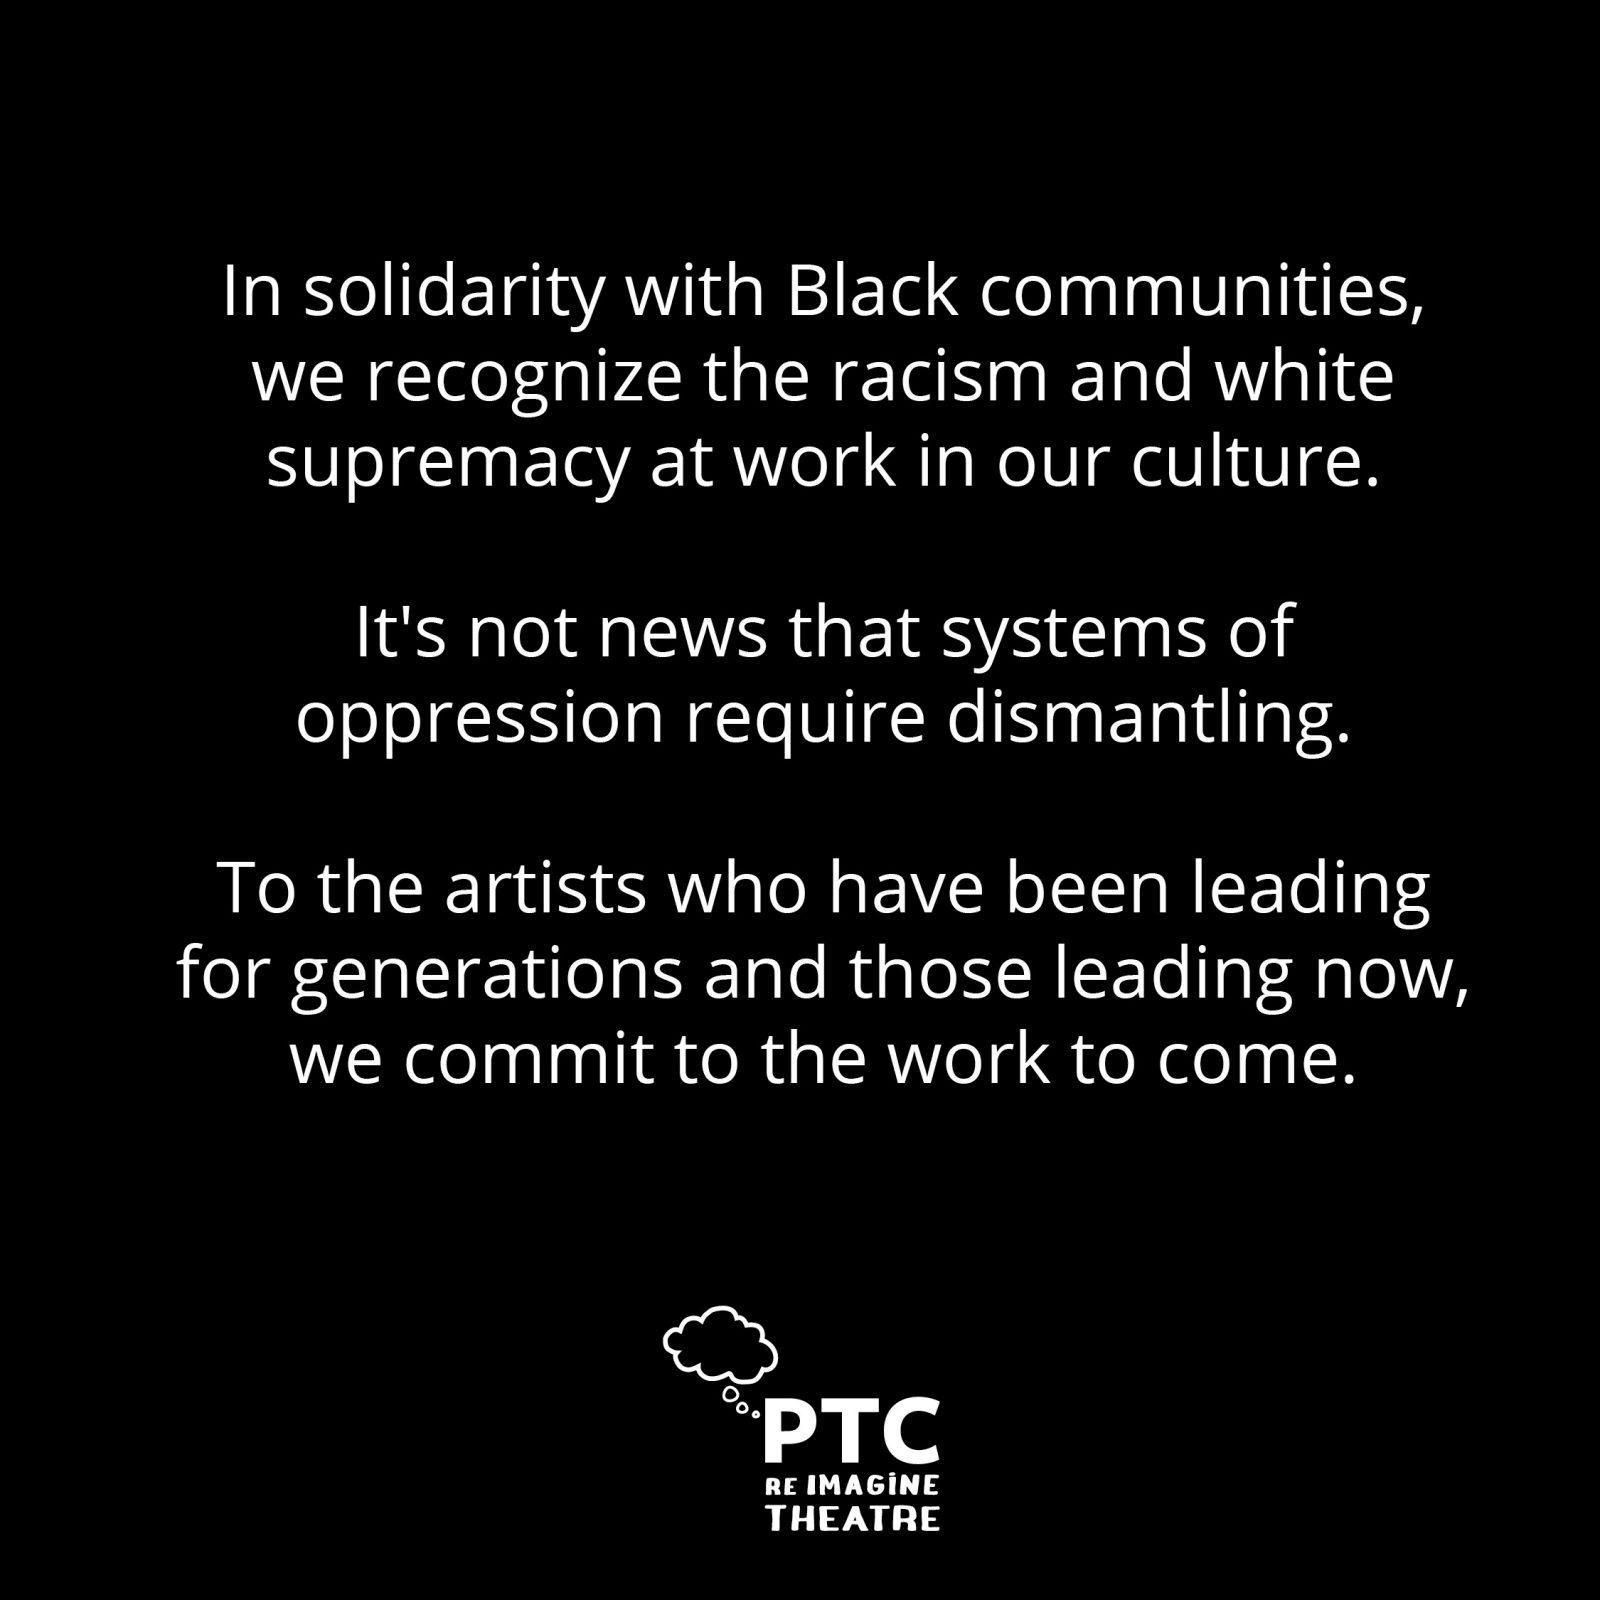 Anti-oppression Statement